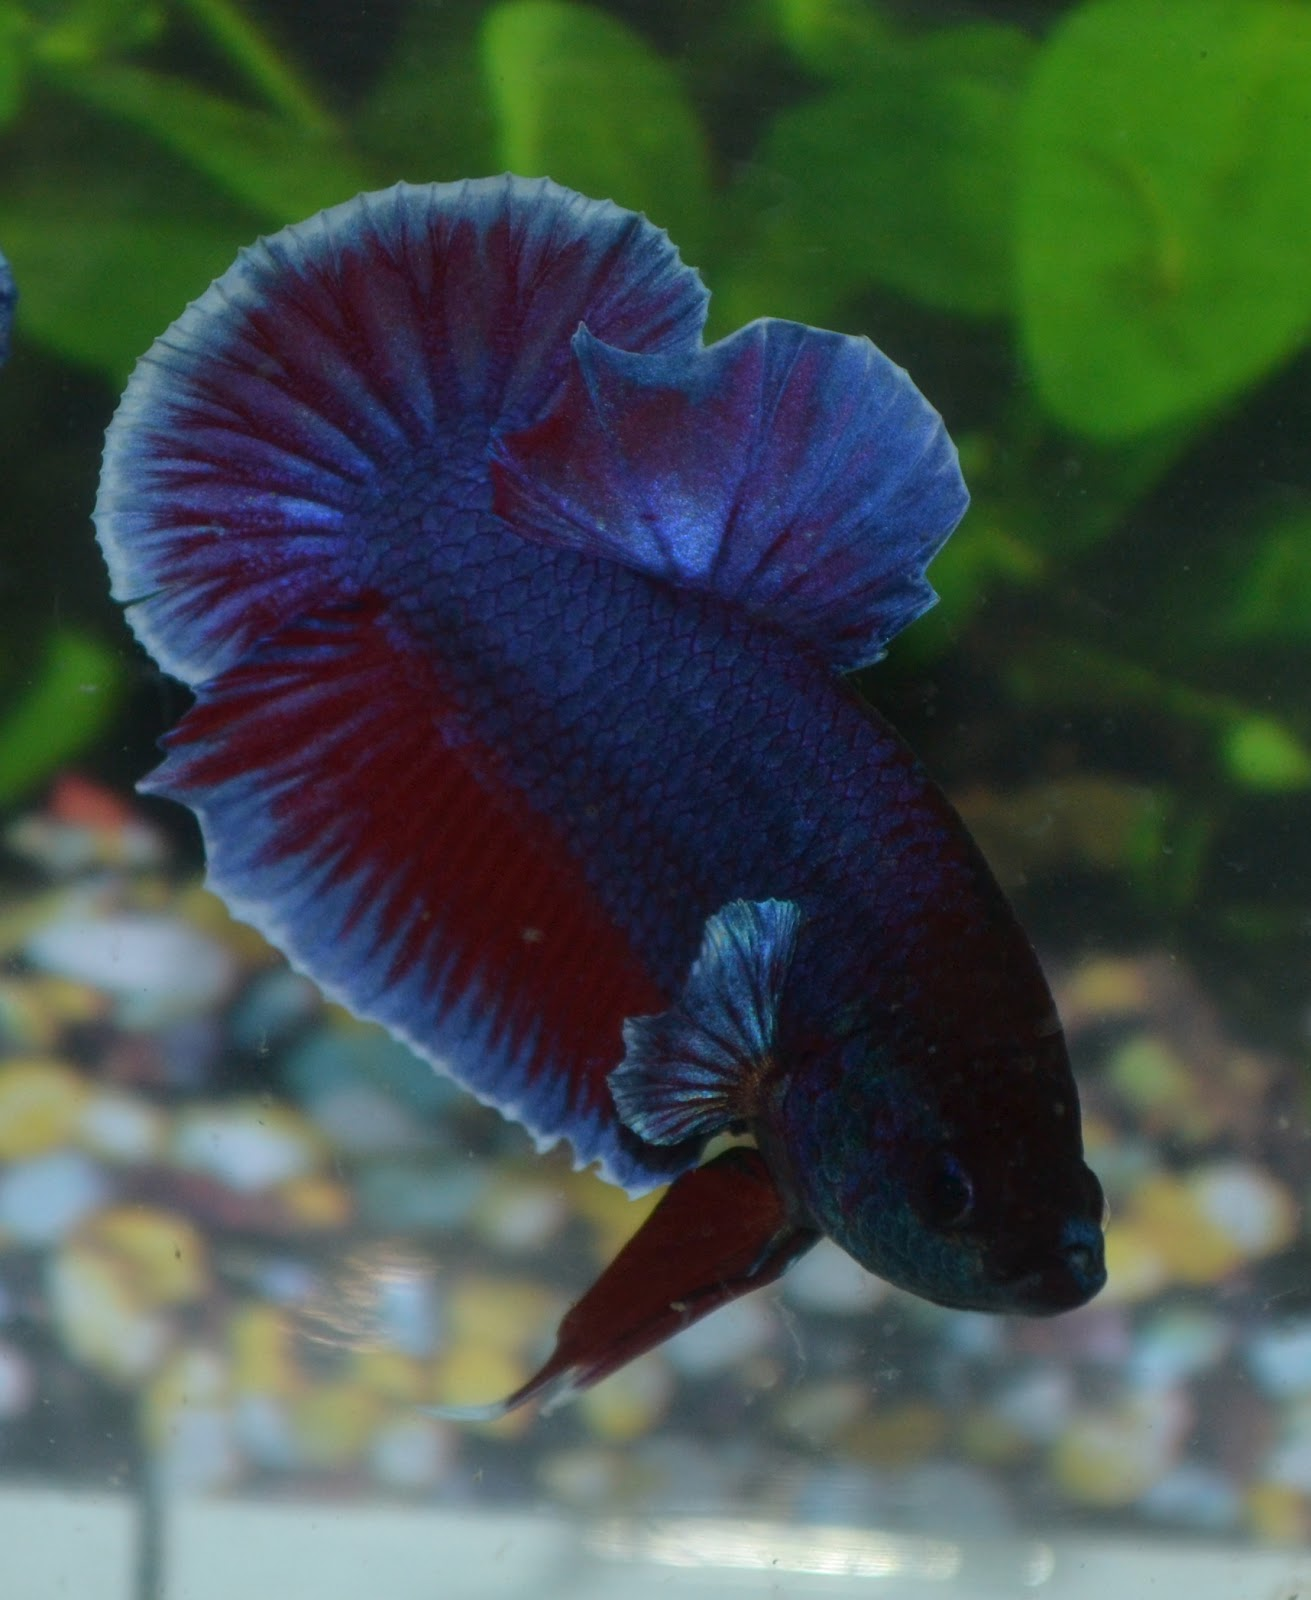 Betta fish for sale online joy studio design gallery for Betta fish online